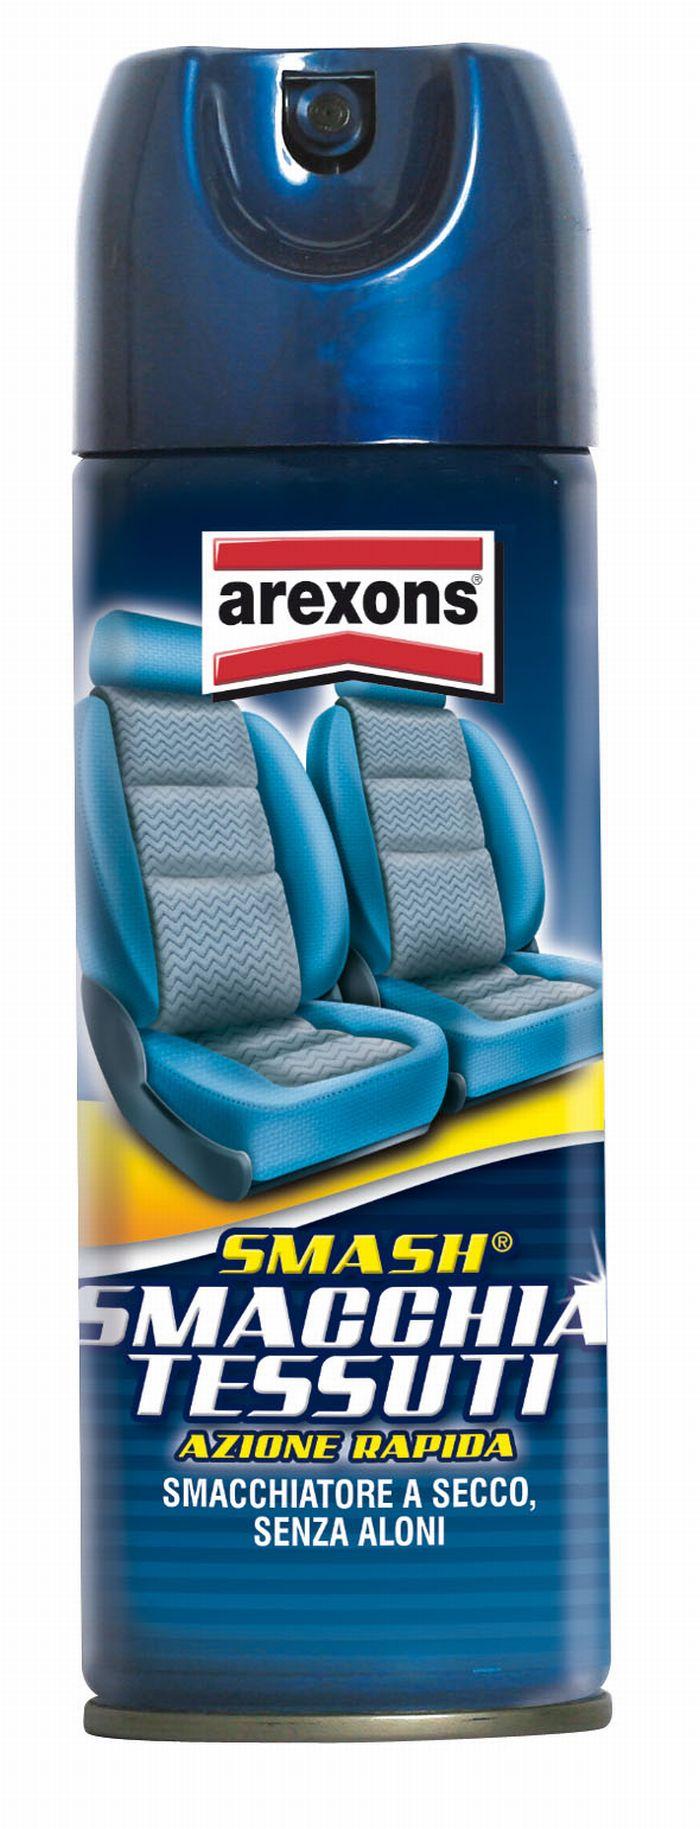 Linea Car Care Arexons: Smash Smacchia Tessuti